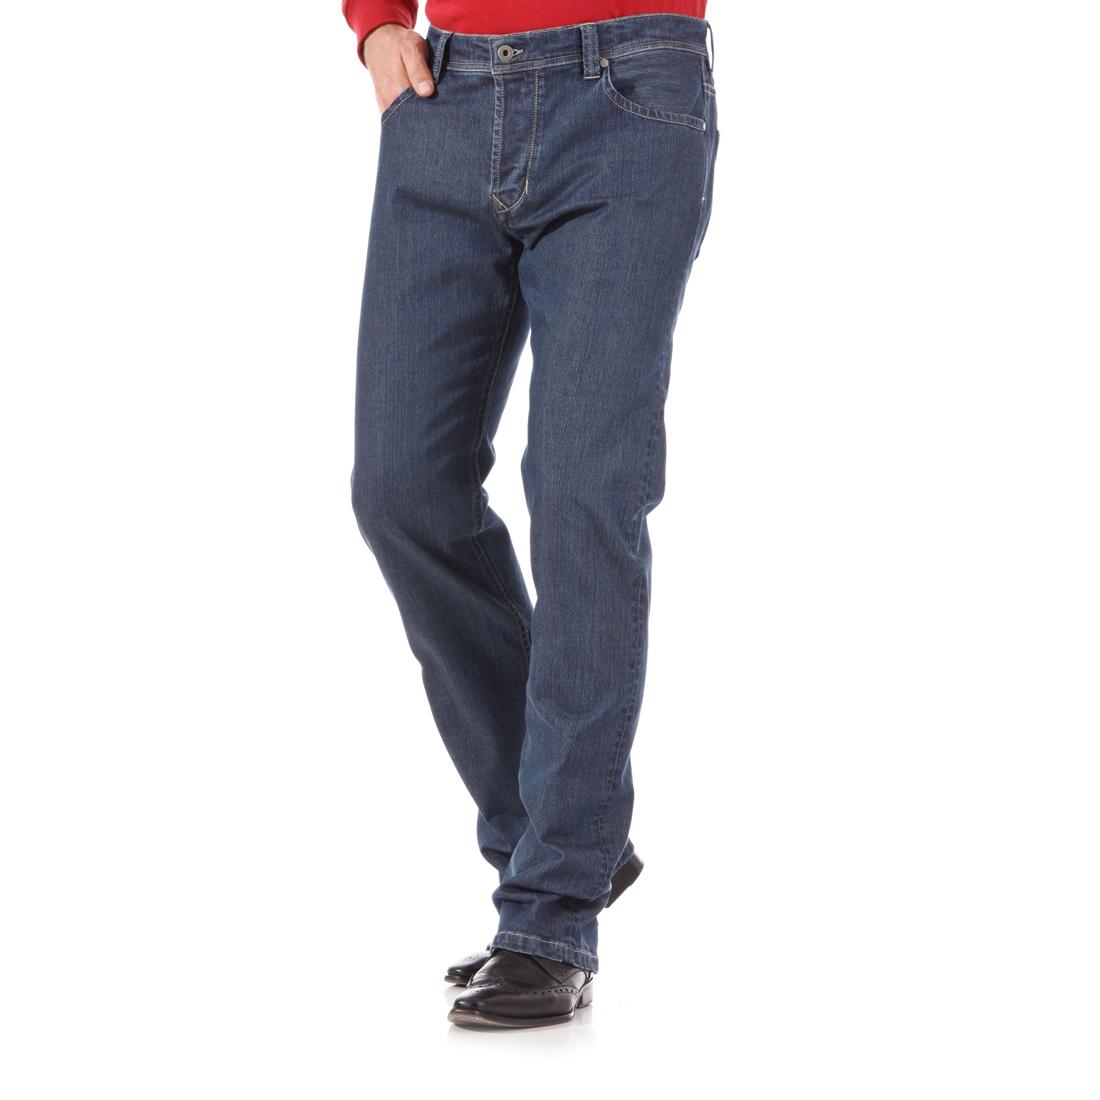 Herren Jeans Stretch Hose